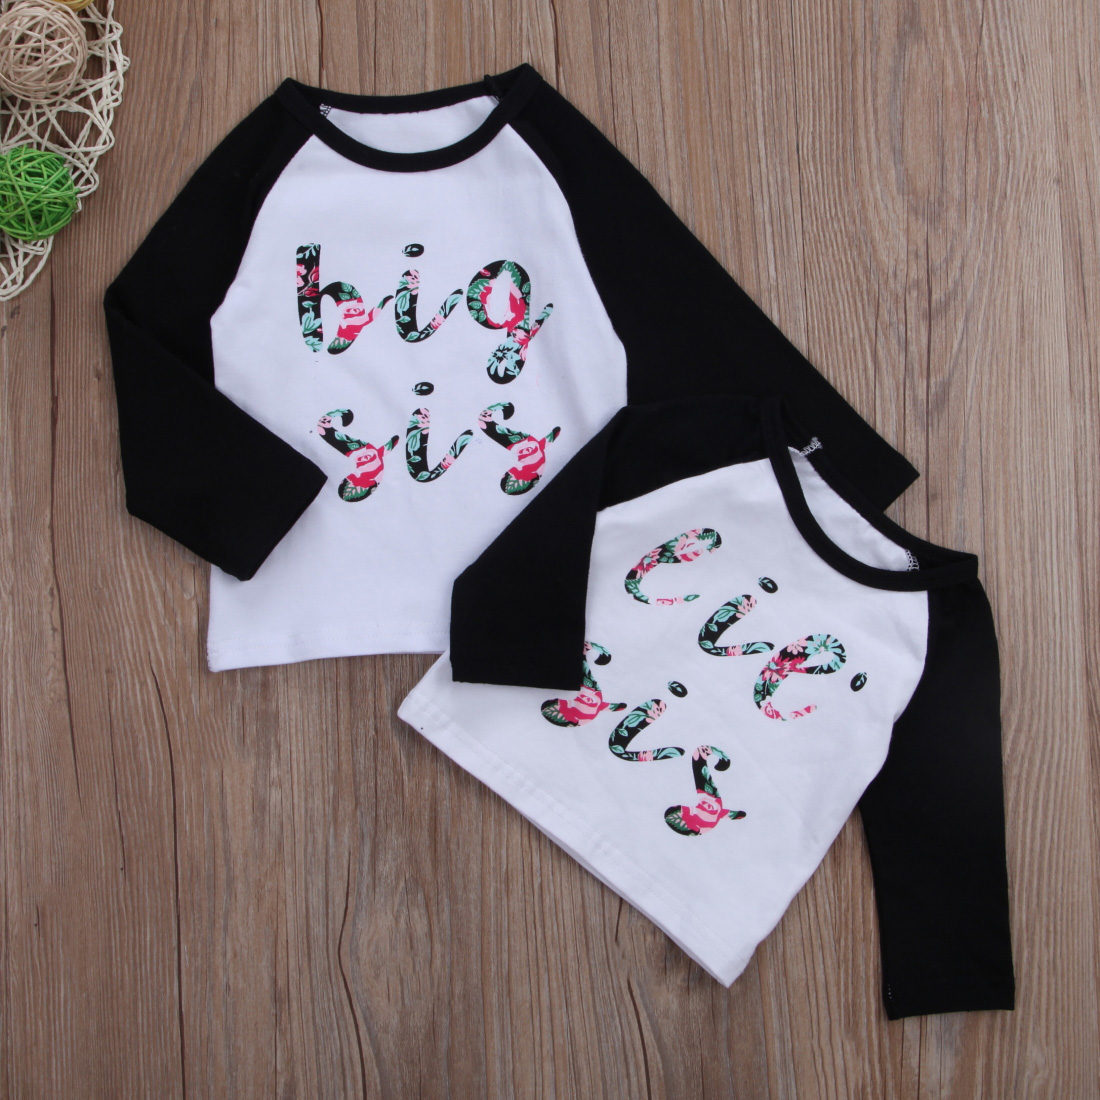 Big Sister Shirt for Toddler t Shirt sis Outfits Girls Floral Tshirt